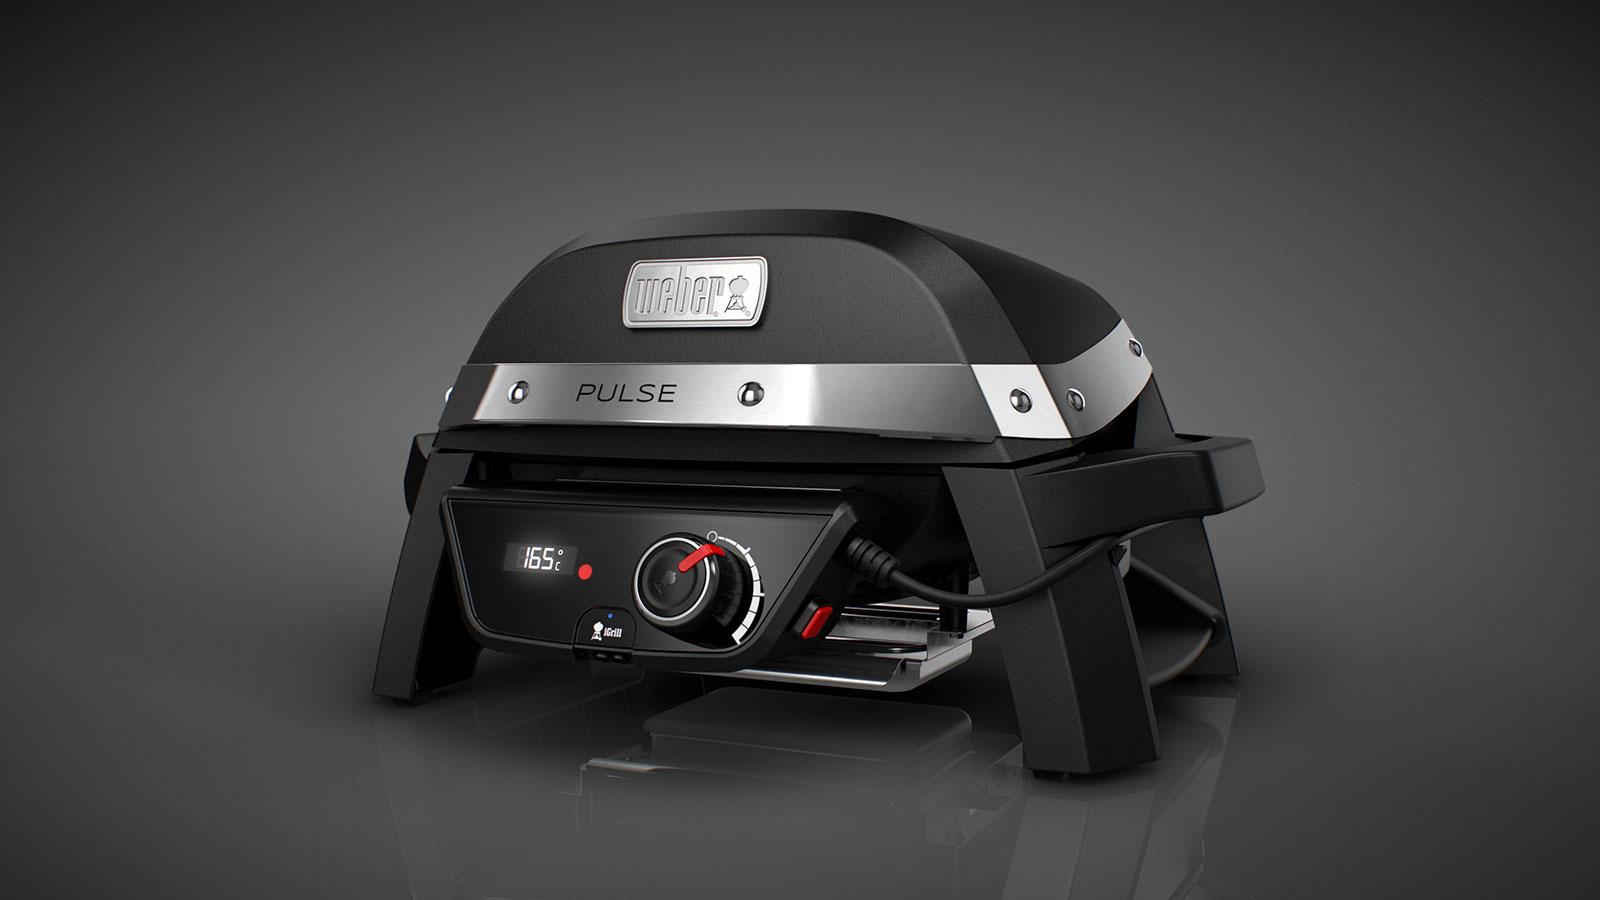 weber pulse 1000 elektrogrill grillmarkt radebeul. Black Bedroom Furniture Sets. Home Design Ideas